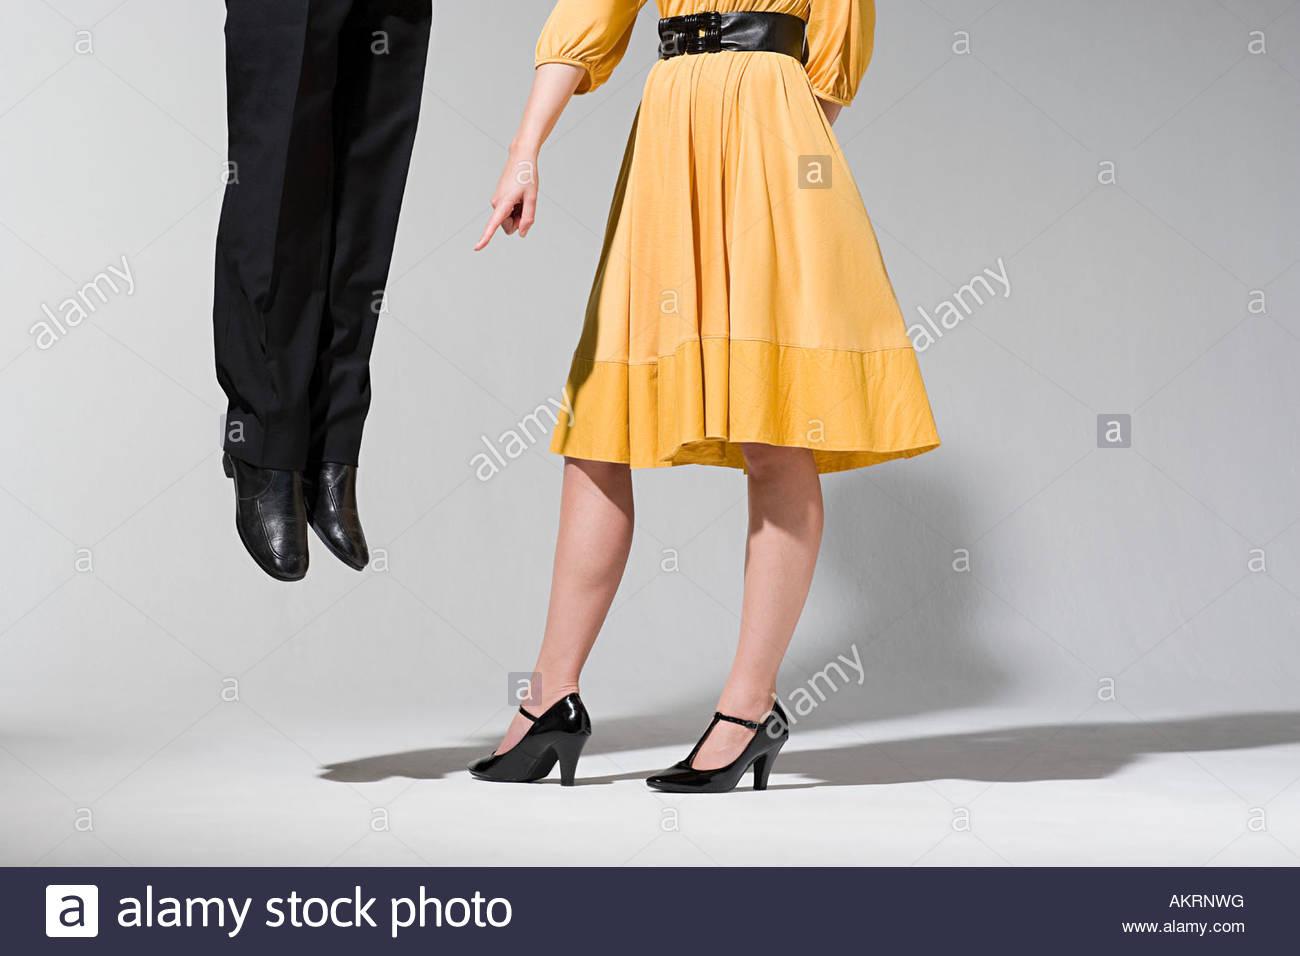 A woman pointing at man jumping - Stock Image